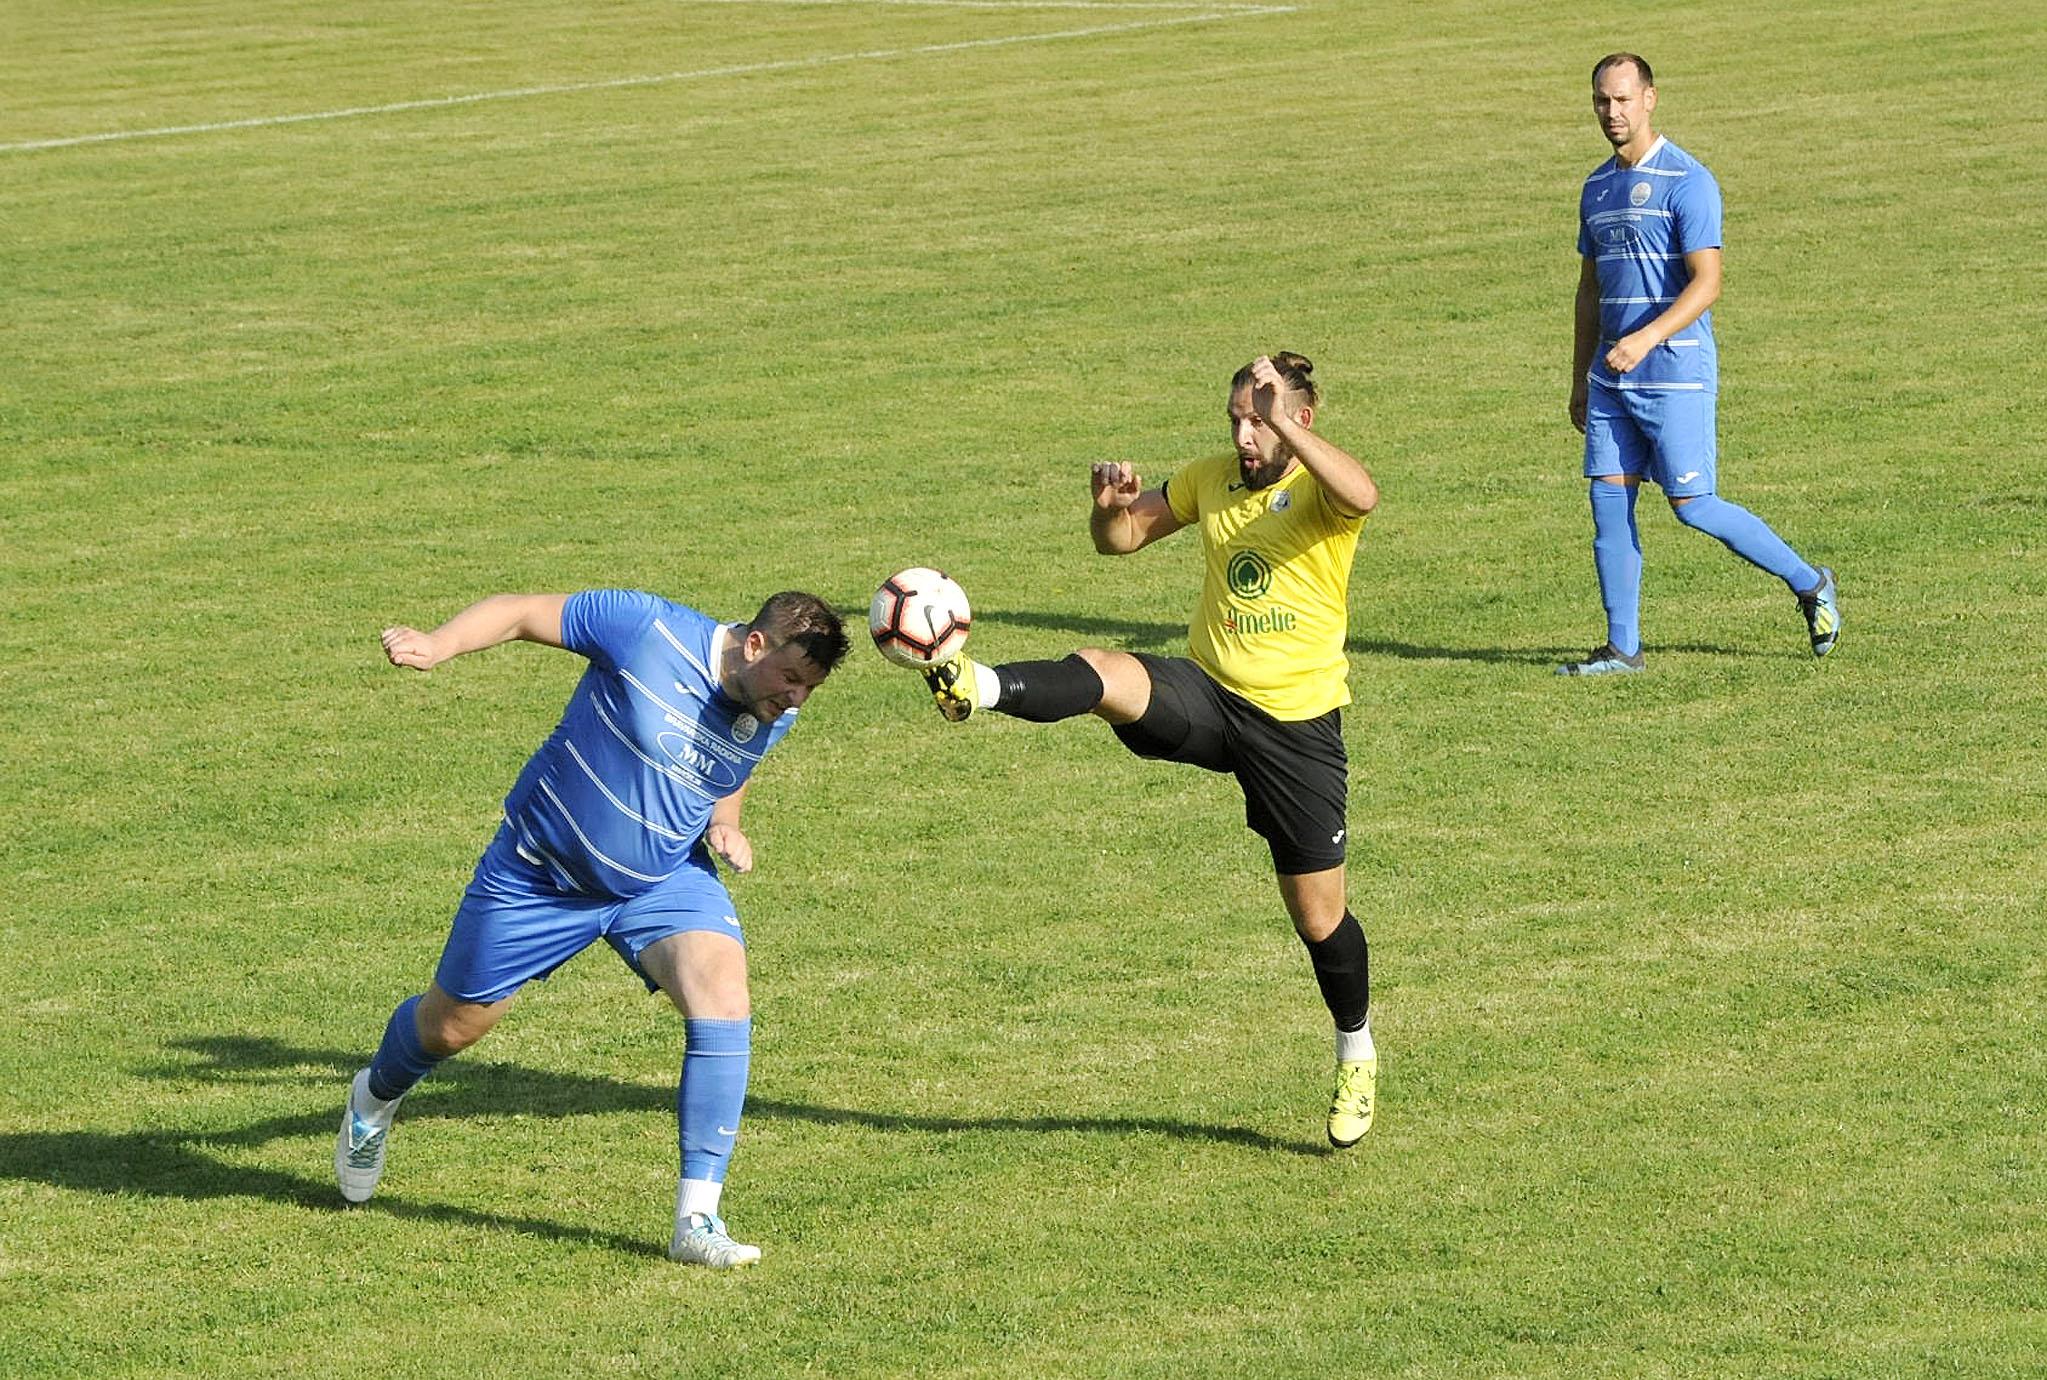 Renato Lučić (Klana) i Mateo Baričević (Lošinj)/Foto S. DRECHSLER